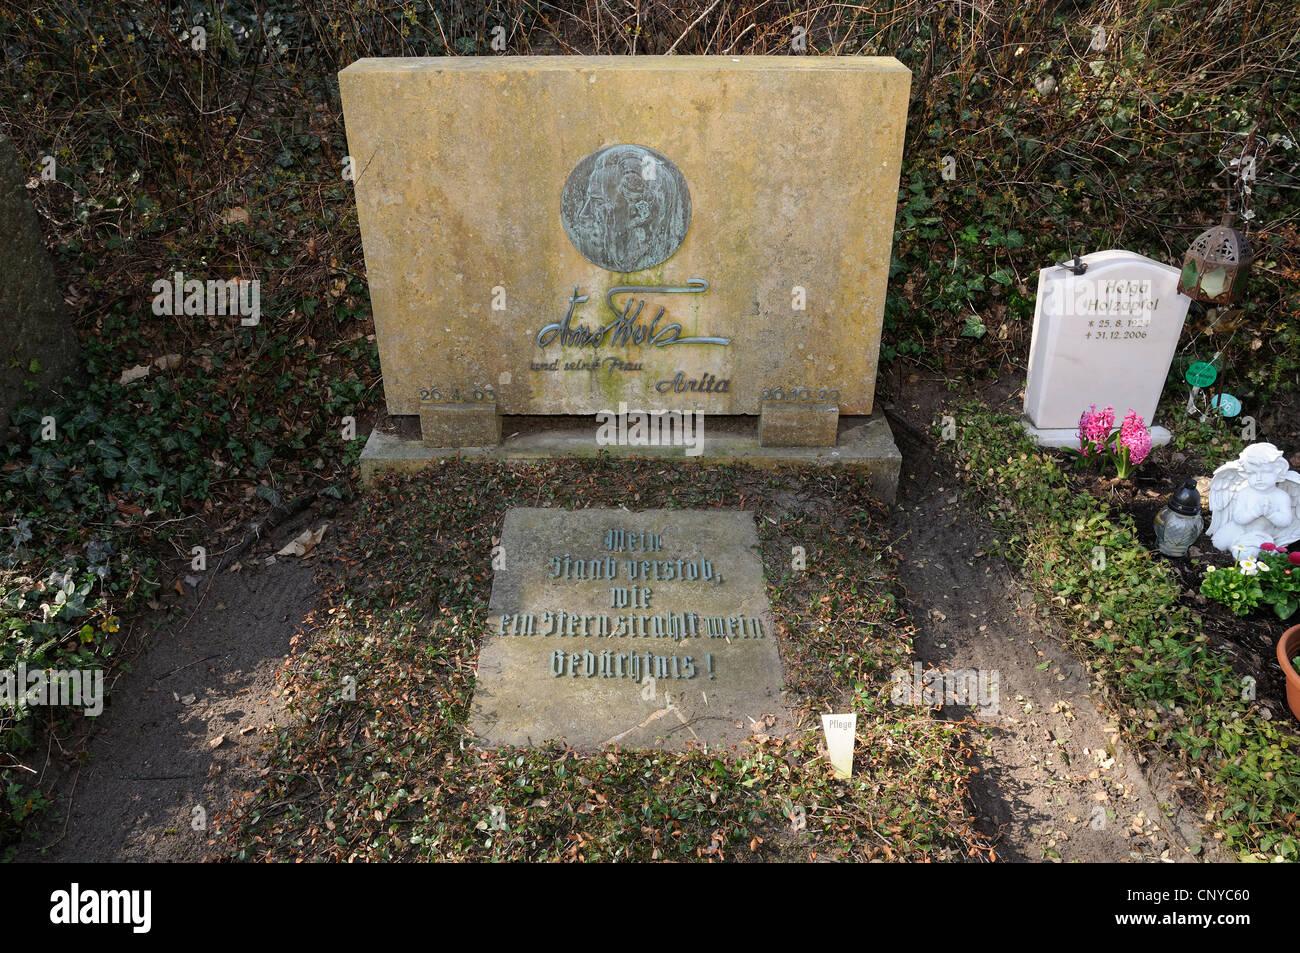 Grave of Arno Holz, 1863 - 1929, German poet of naturalism and impressionism, Waldfriedhof Heerstrasse, Berlin, - Stock Image